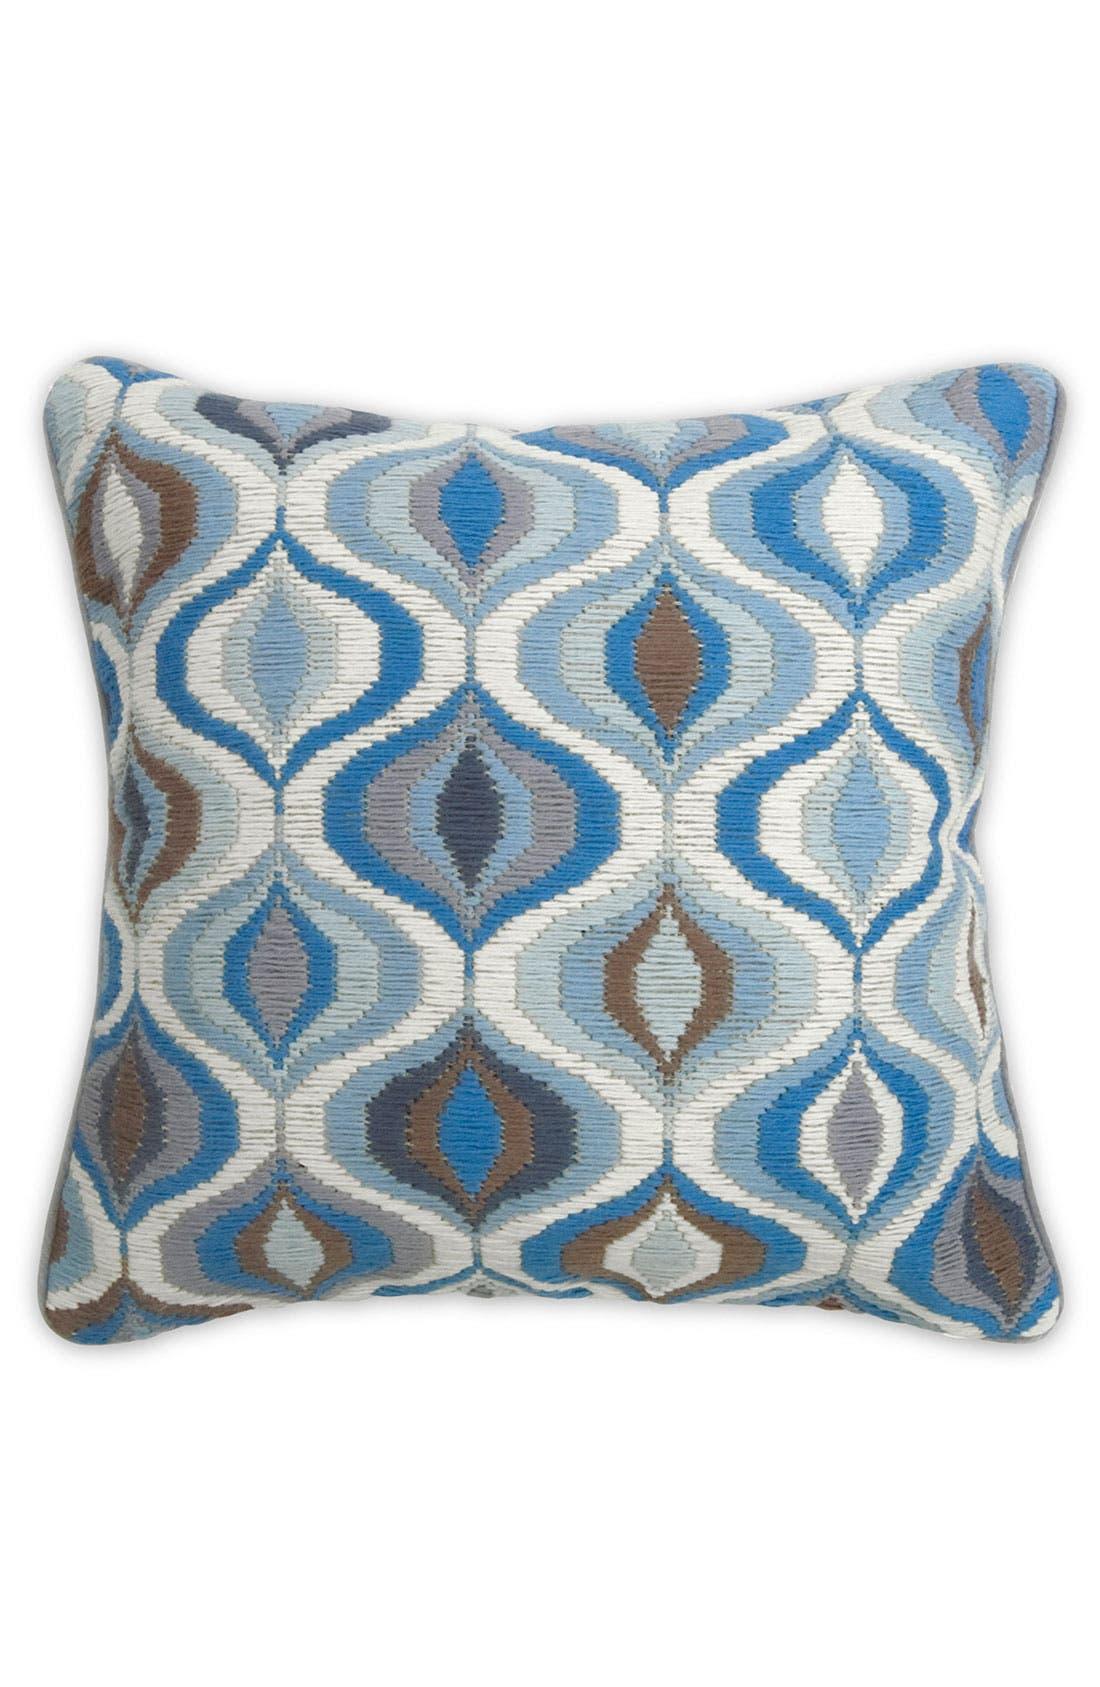 Main Image - Jonathan Adler 'Bargello Waves' Pillow